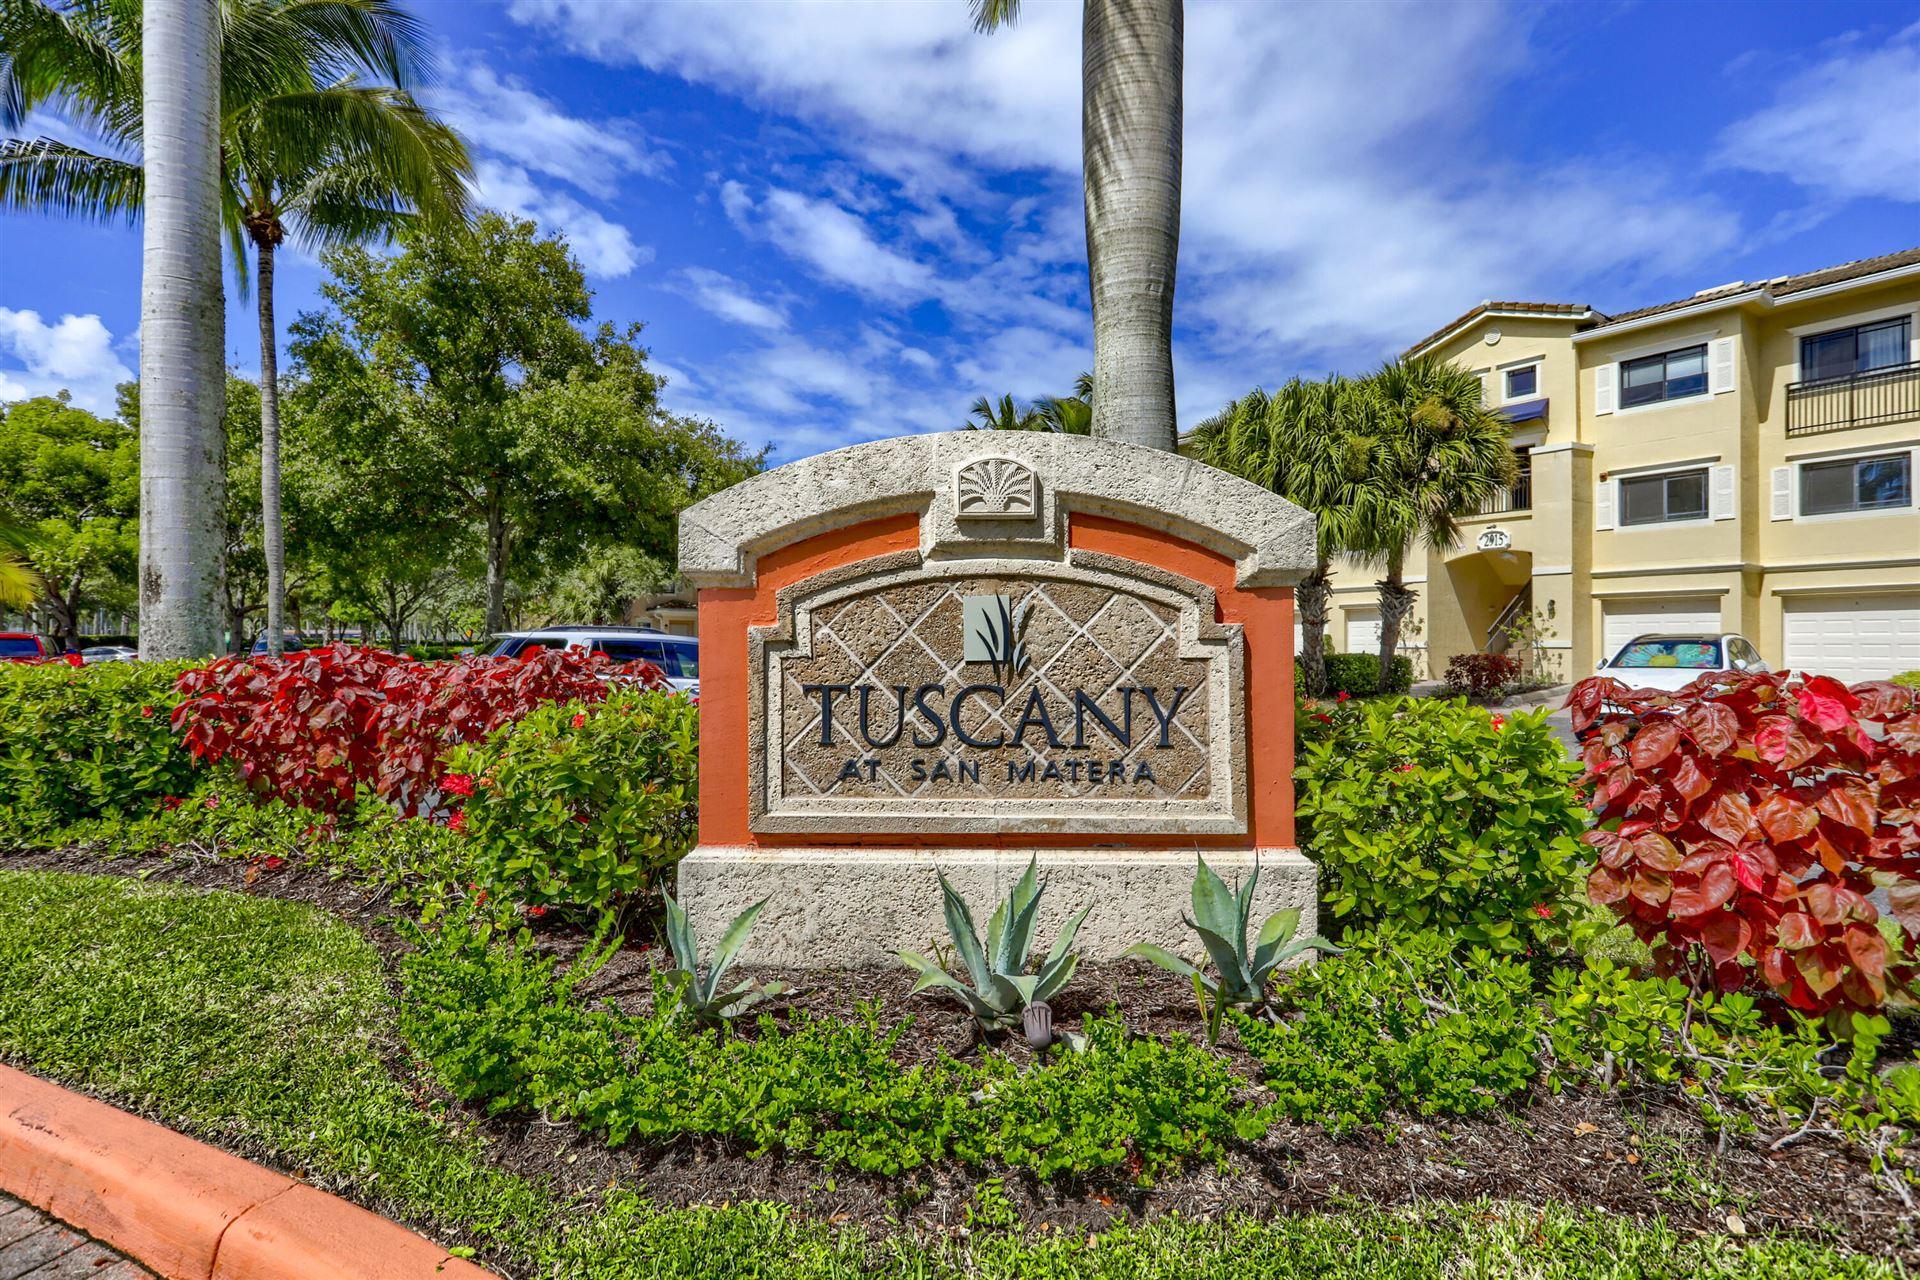 Photo for 2916 Tuscany Court #114, Palm Beach Gardens, FL 33410 (MLS # RX-10751865)